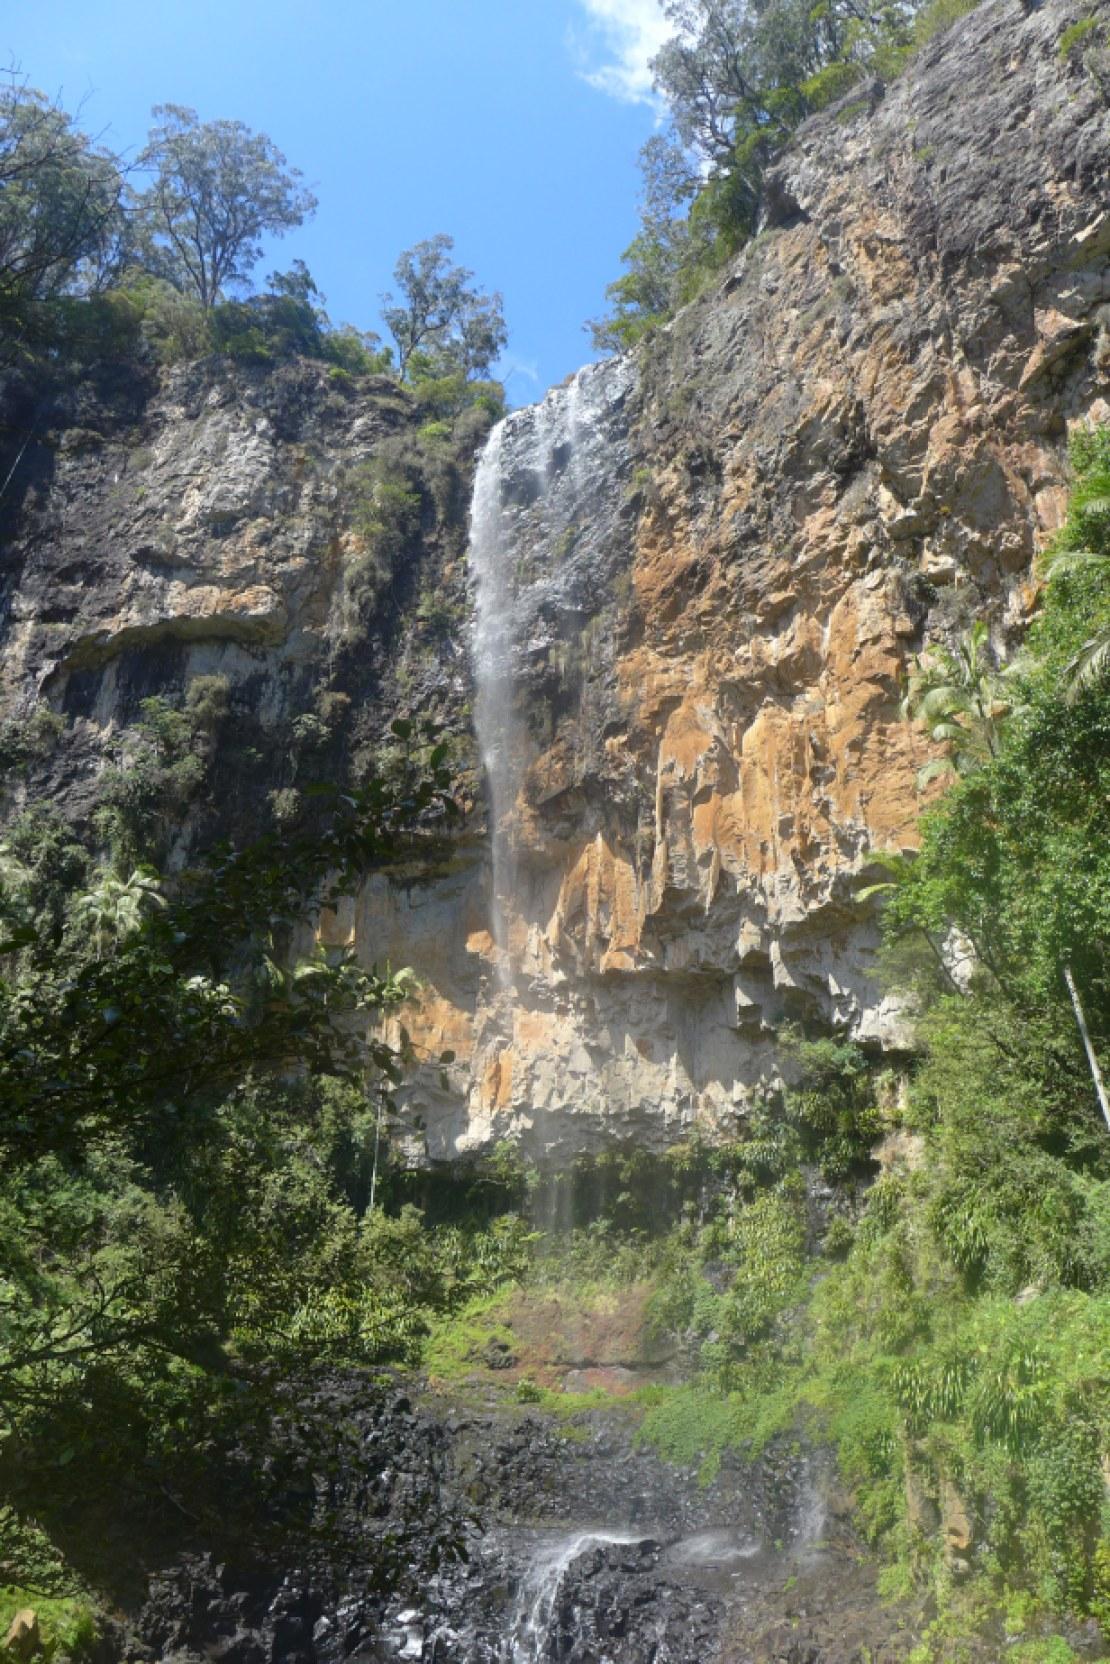 Bottom of Purling brook falls